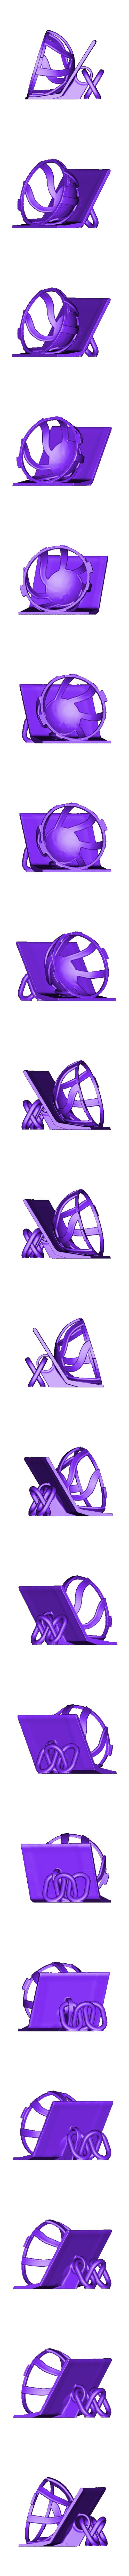 boule_mangeoire_haut_Ev1.stl Descargar archivo STL BOLA DE AVES Ev1 • Modelo imprimible en 3D, 3d-fabric-jean-pierre